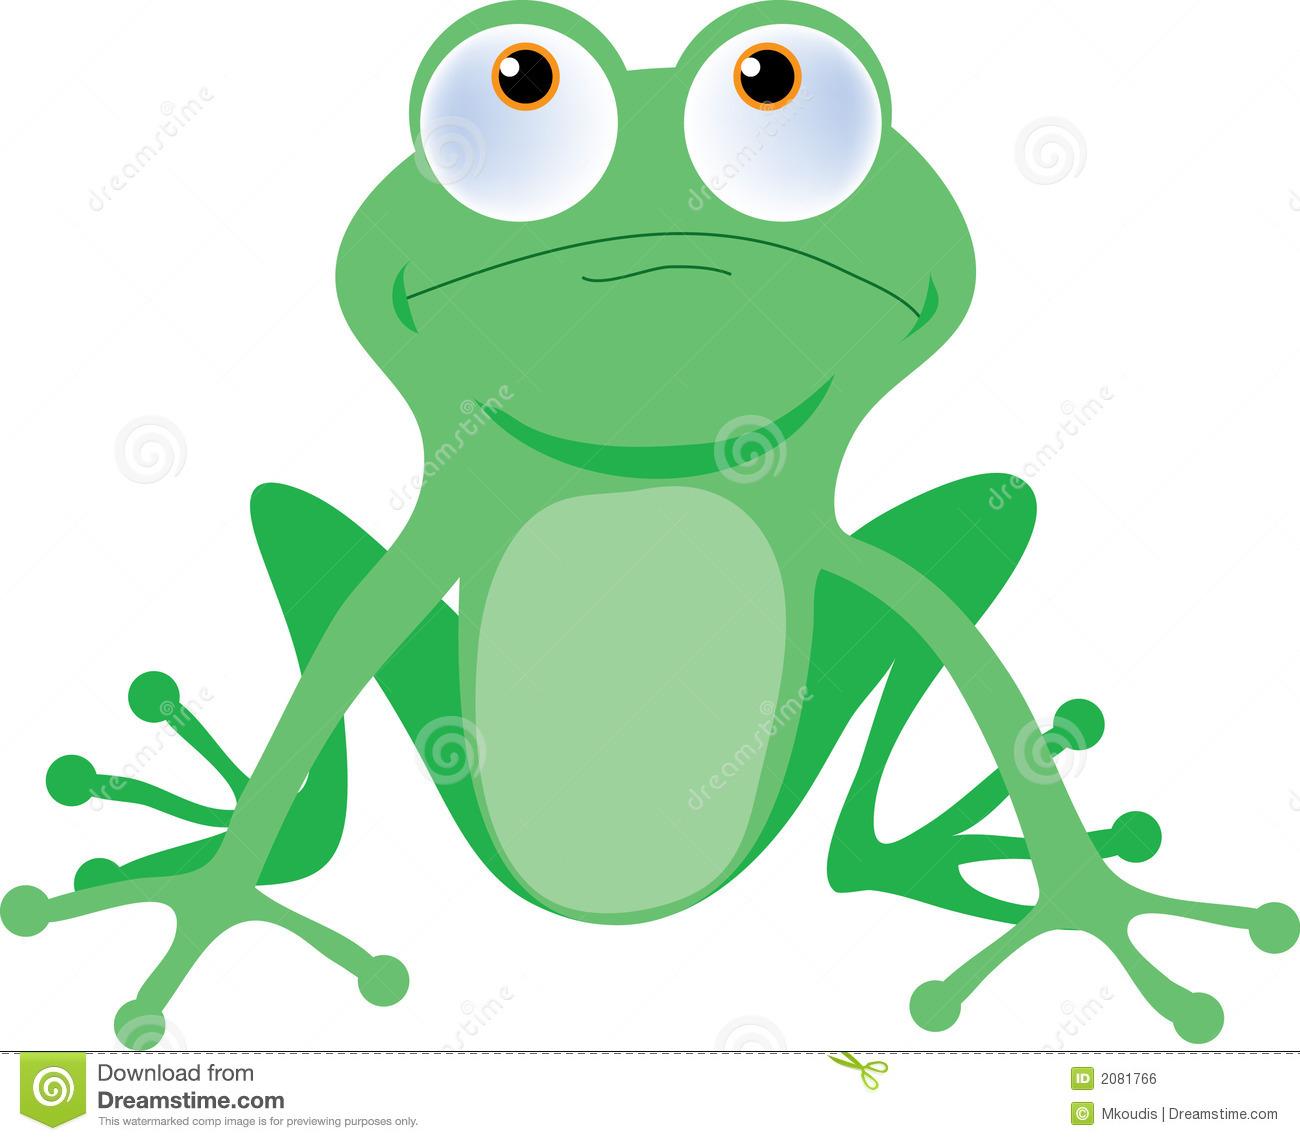 Tomato frog clipart - Clipground